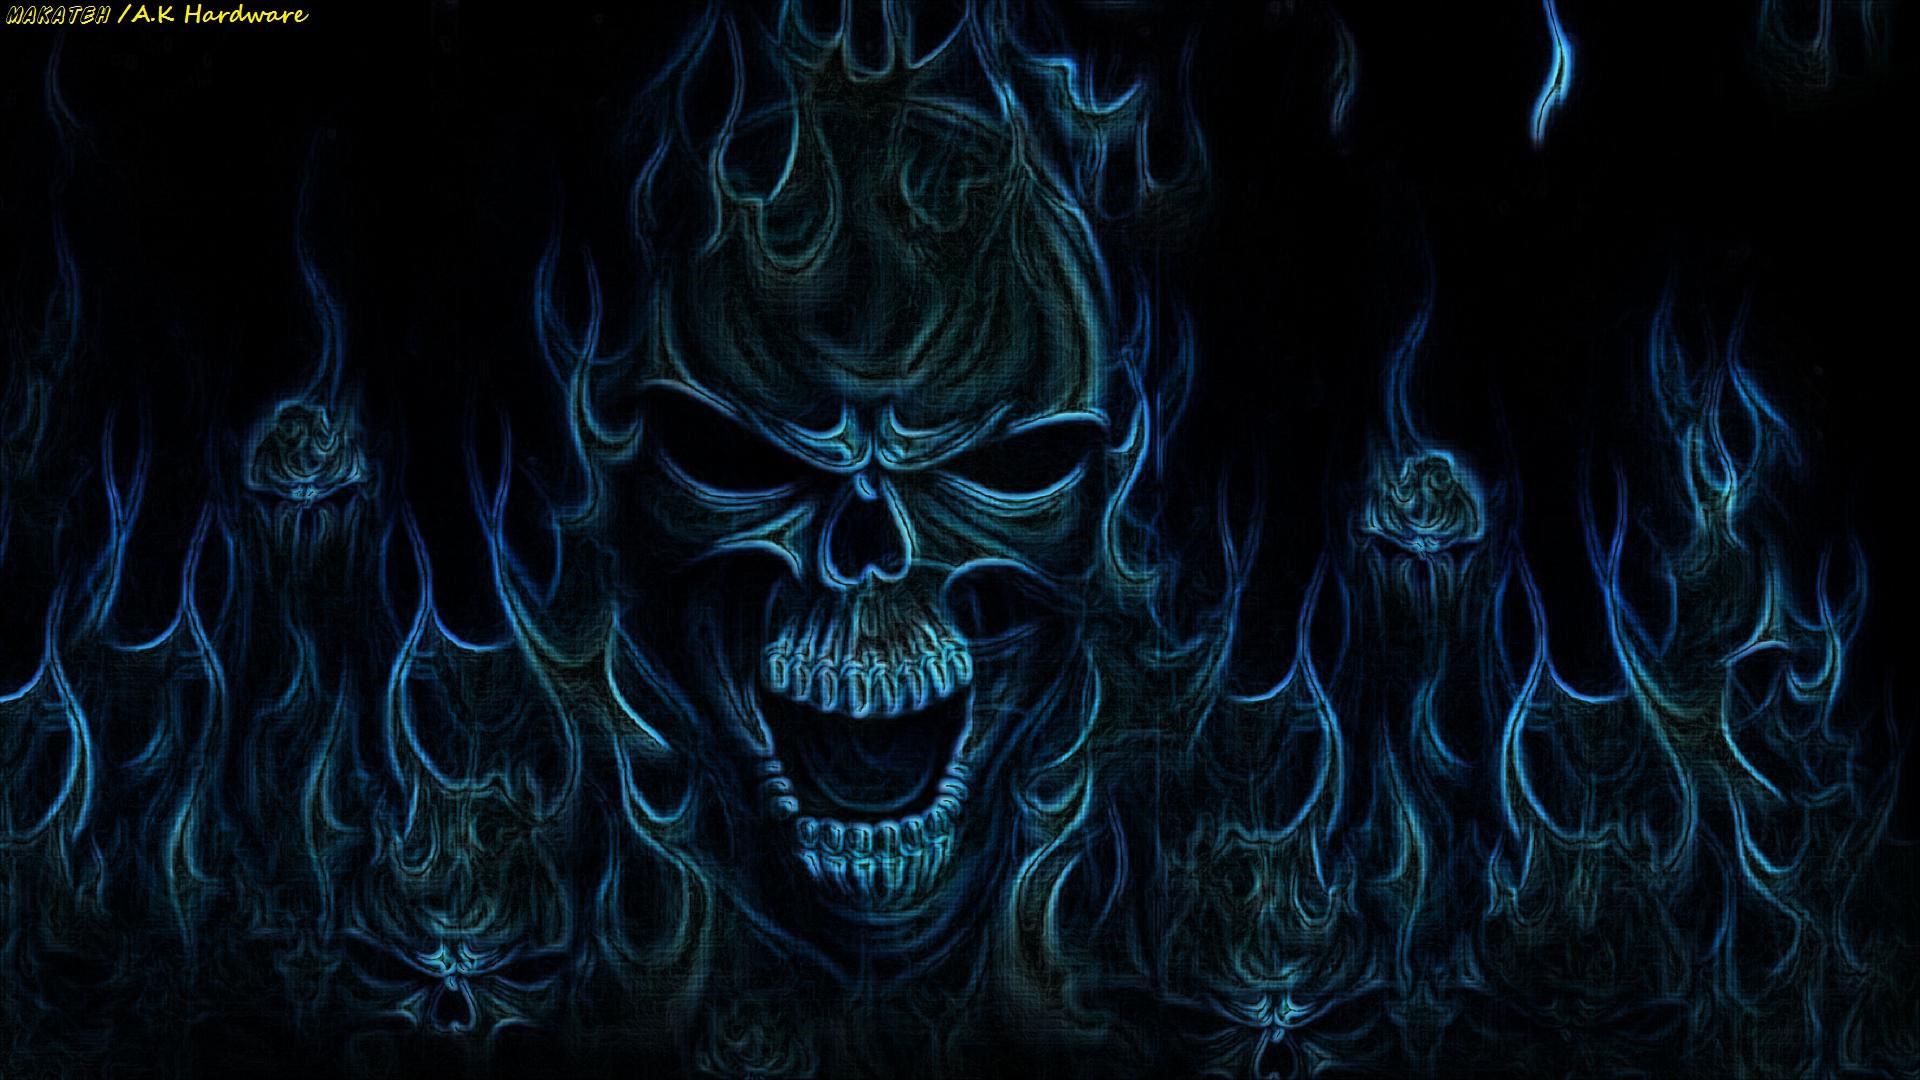 hd pics photos beautiful skull danger neon blue smoke stunning horror hd  quality desktop background wallpaper